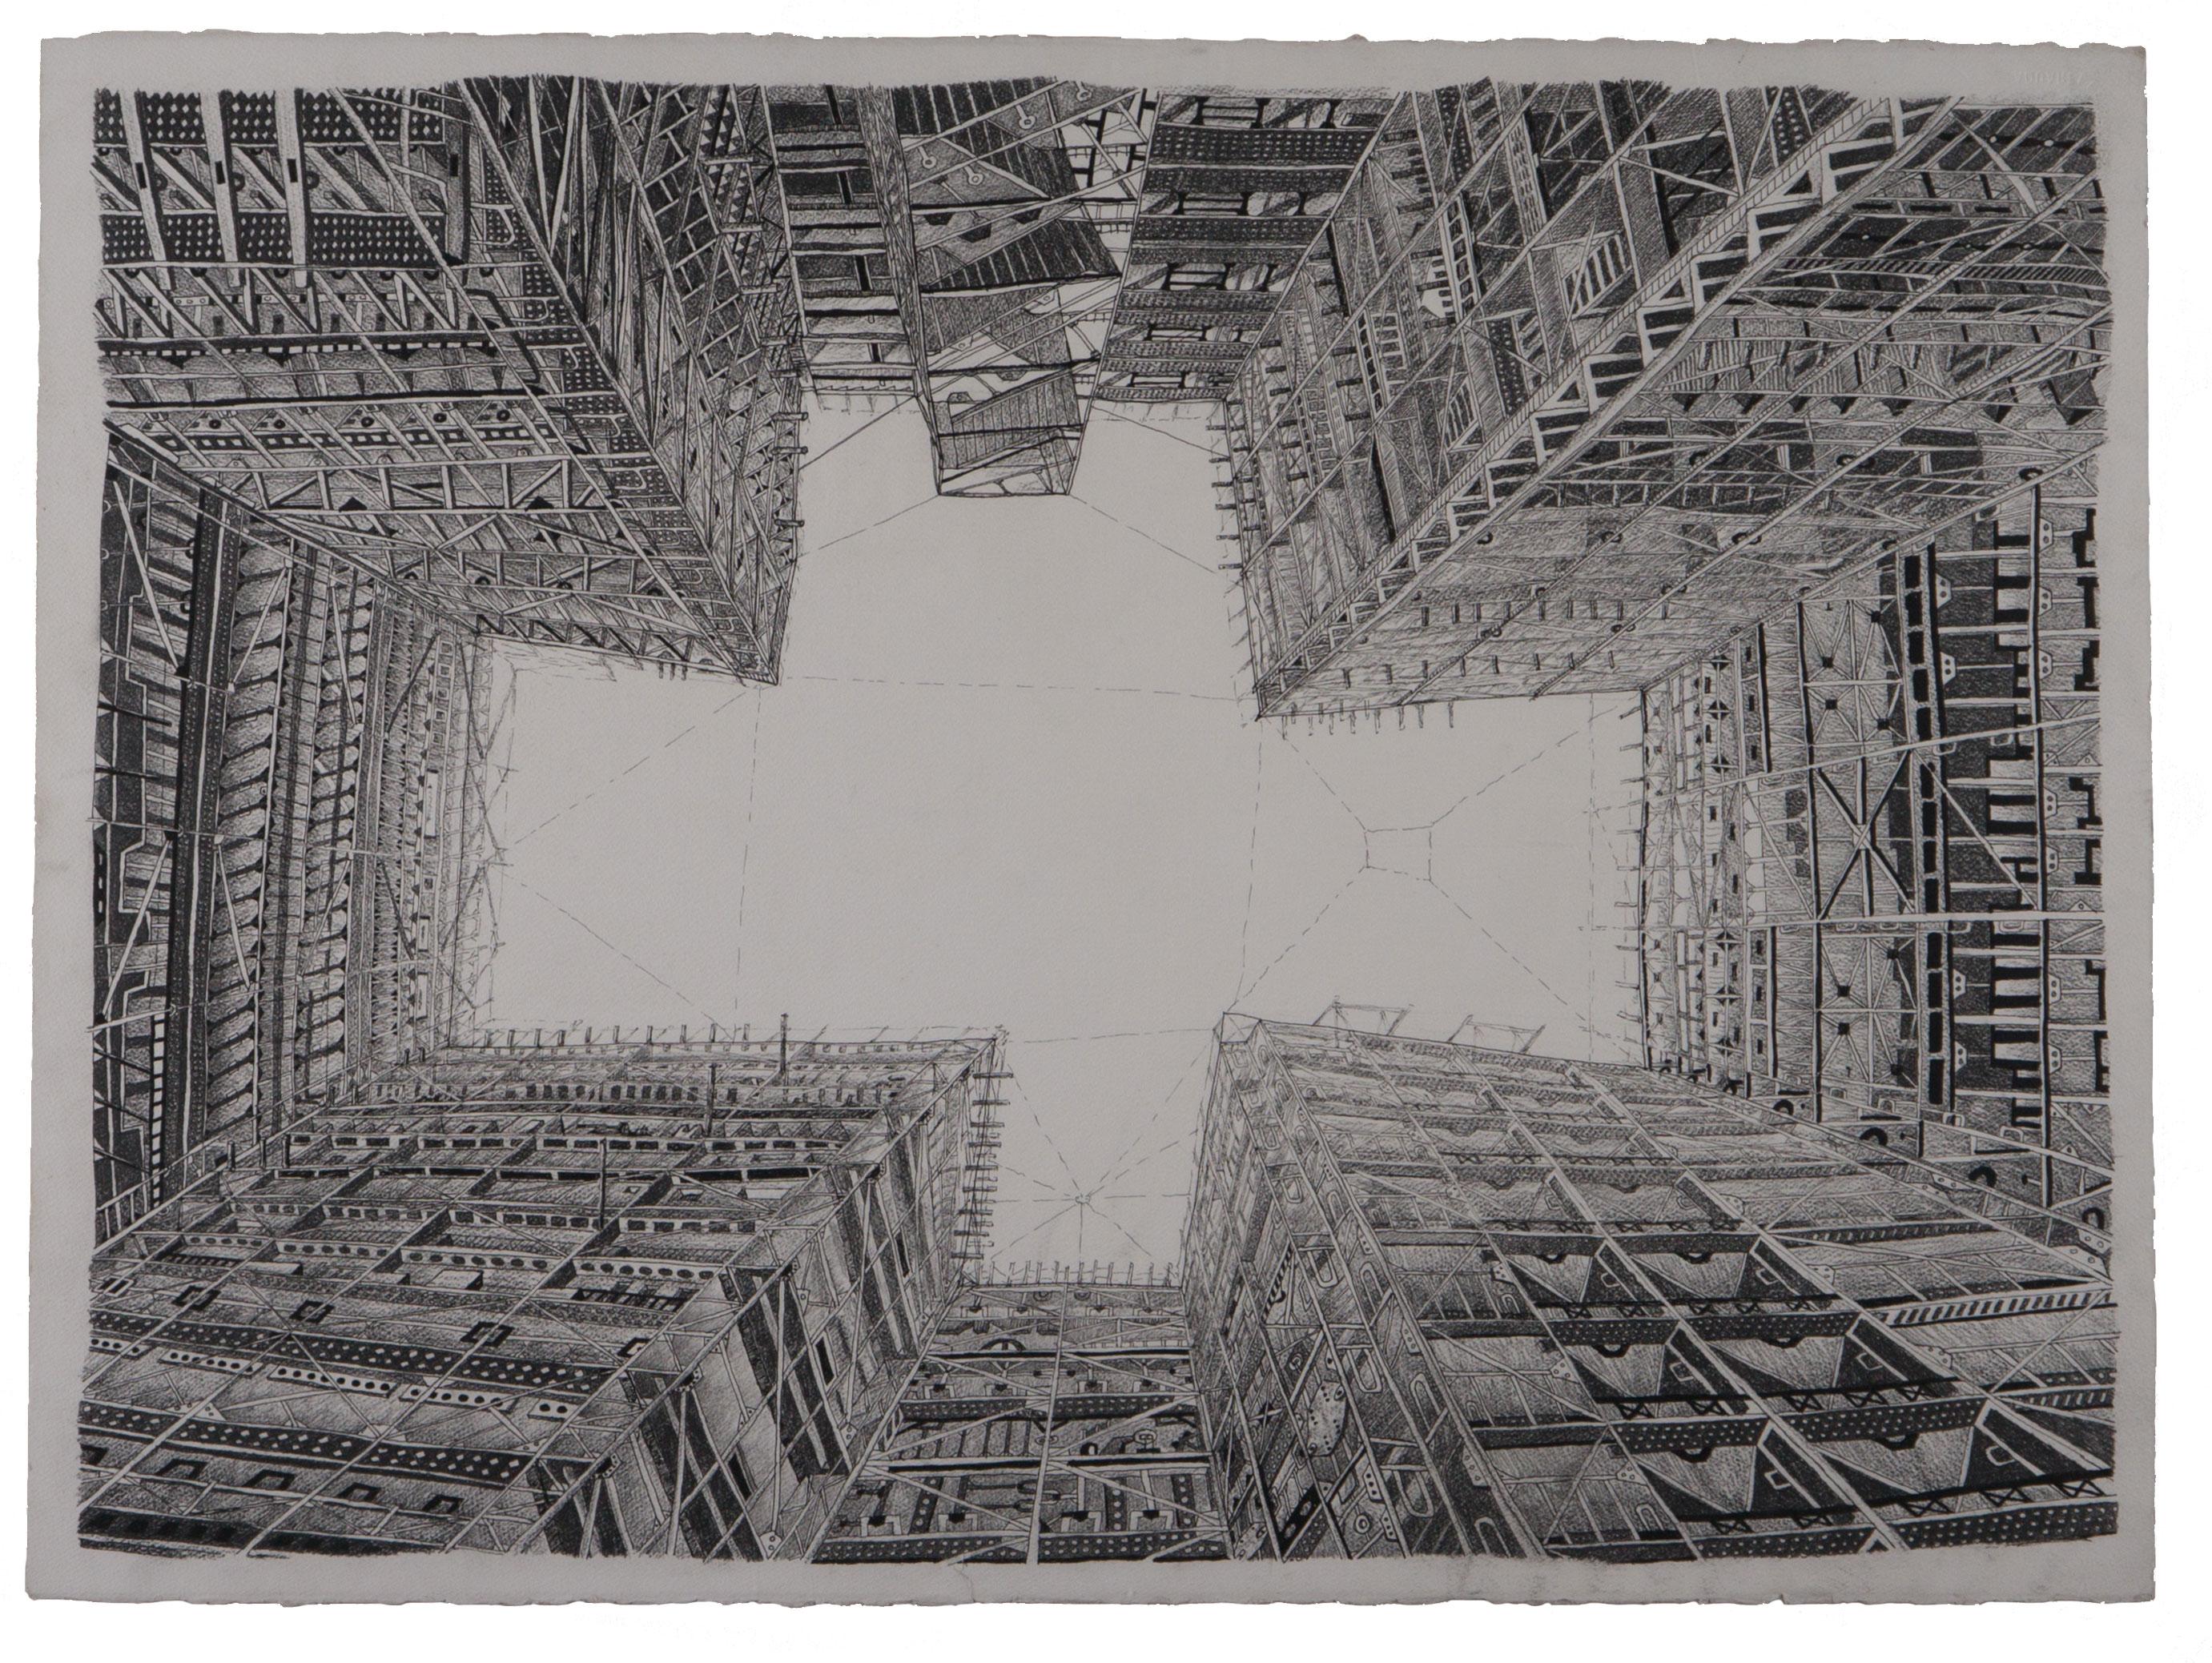 'Estructura' Manuel Rivas